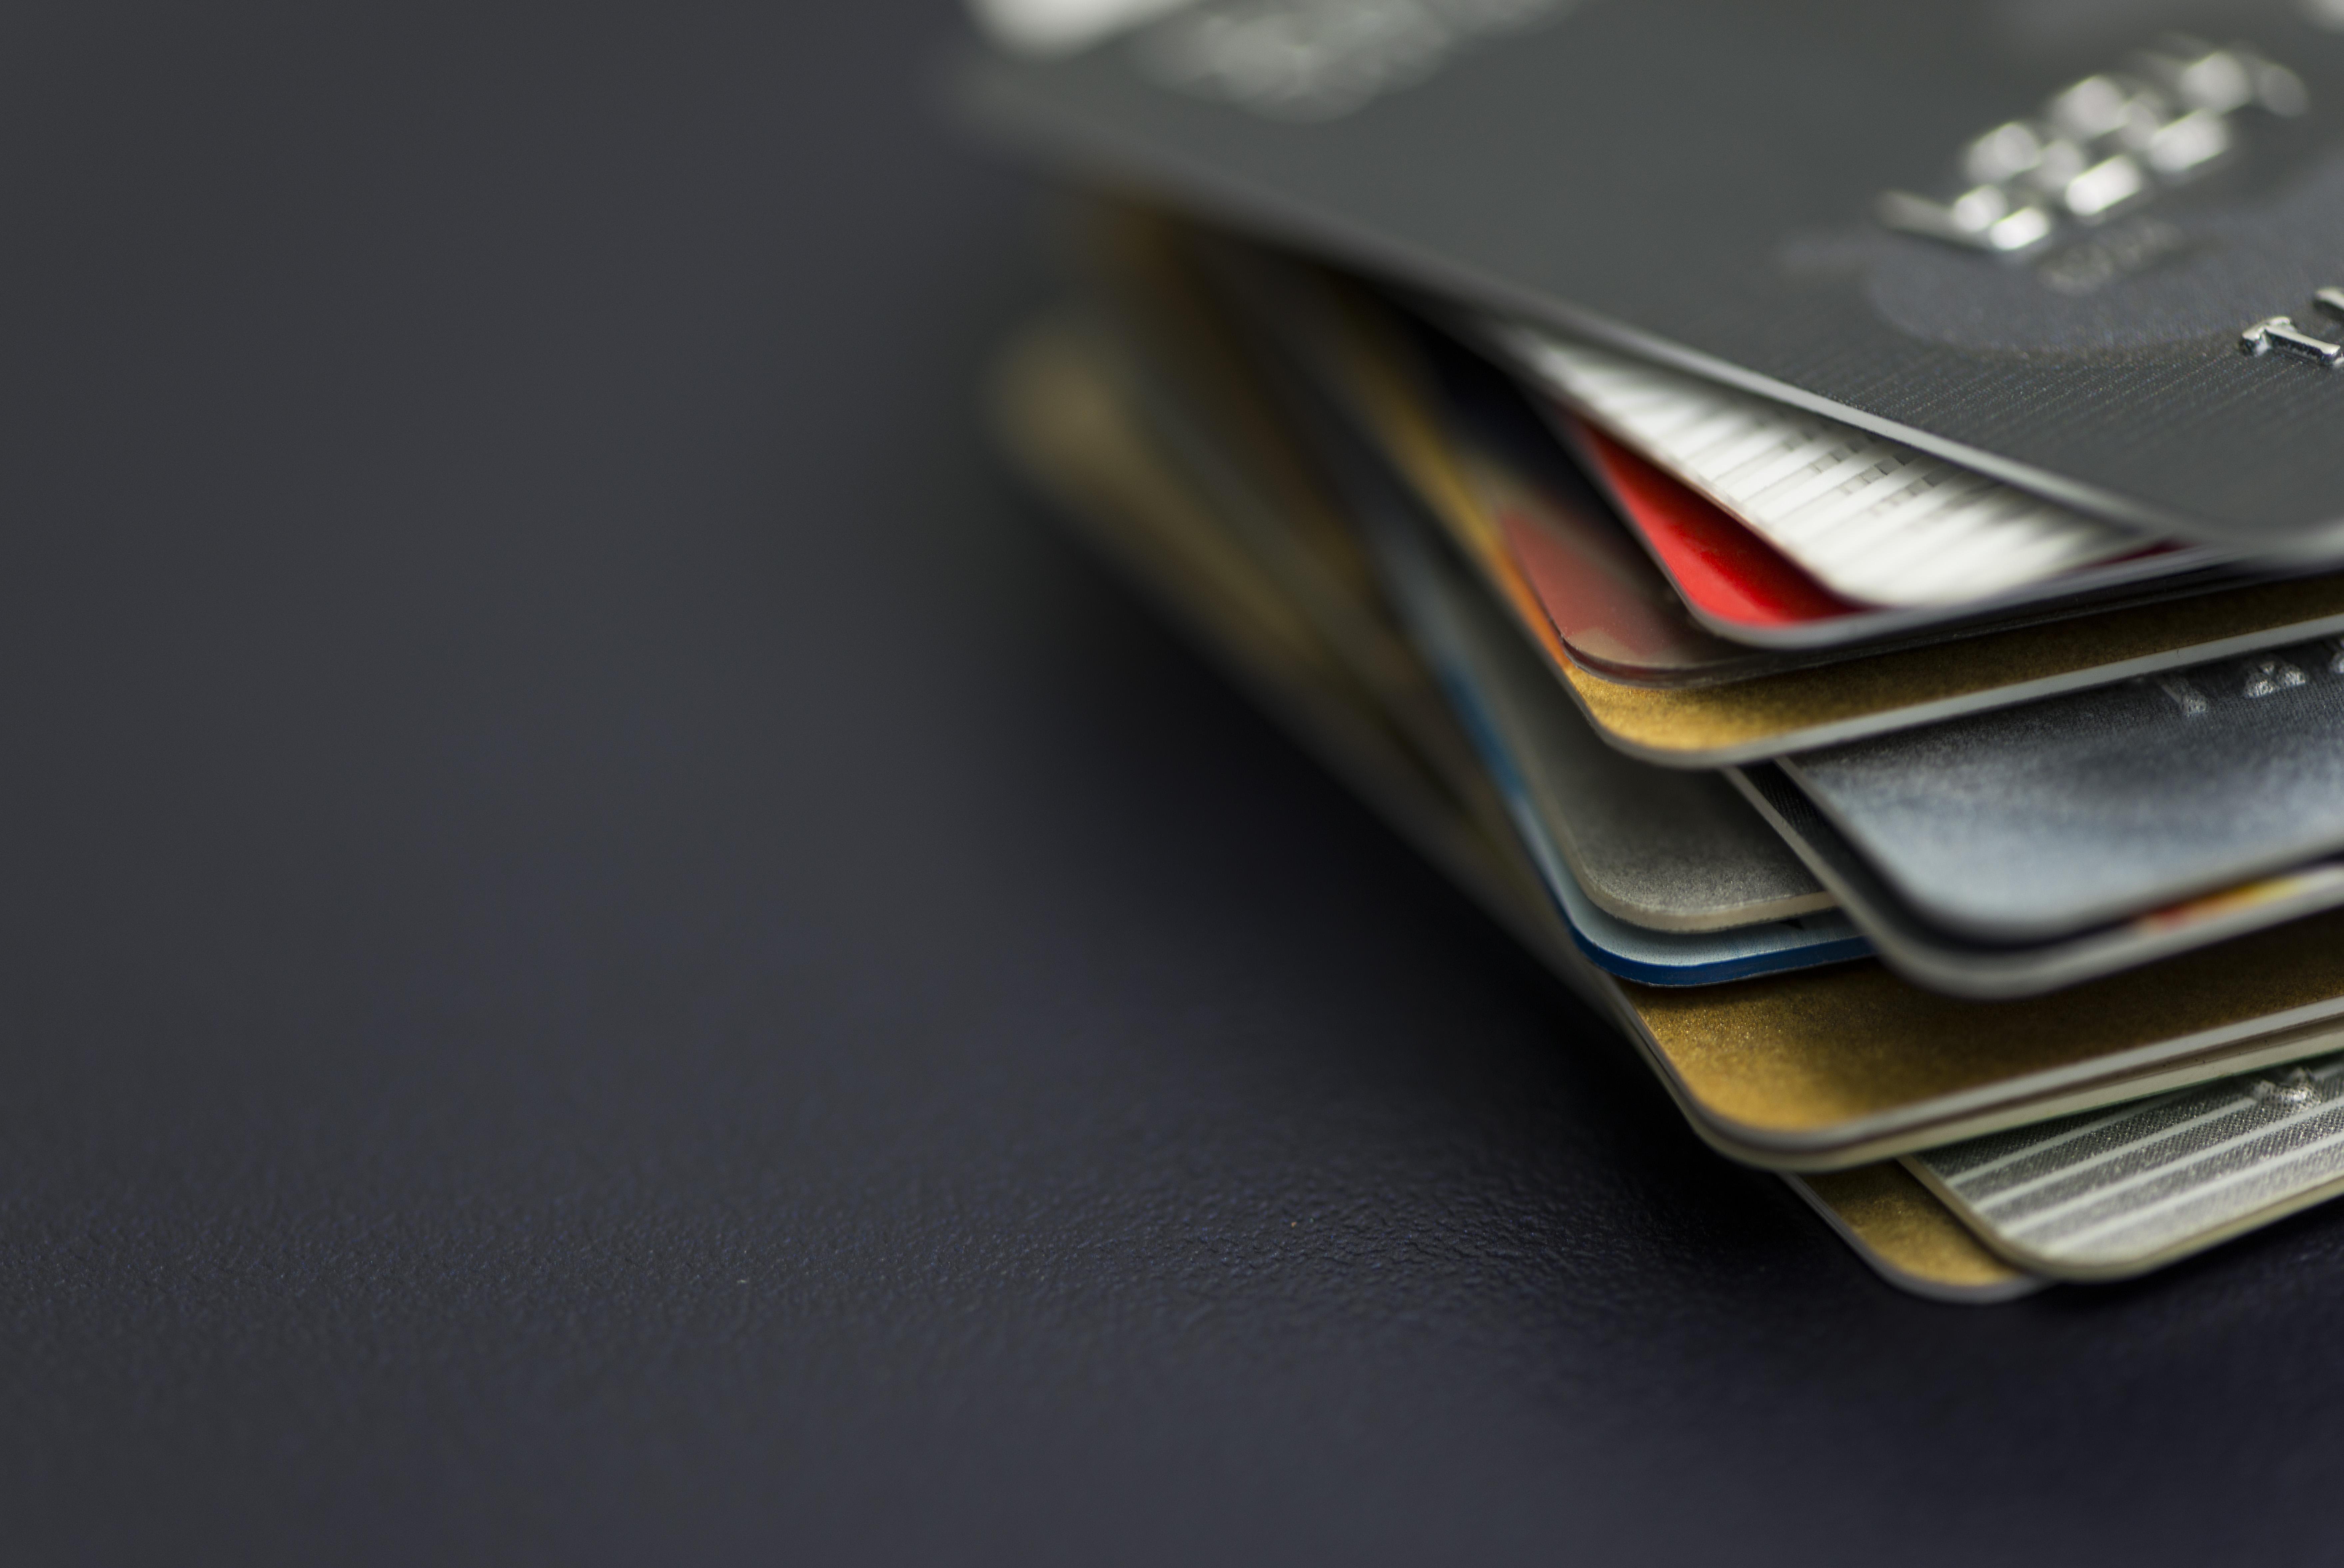 Credit cards on a desk